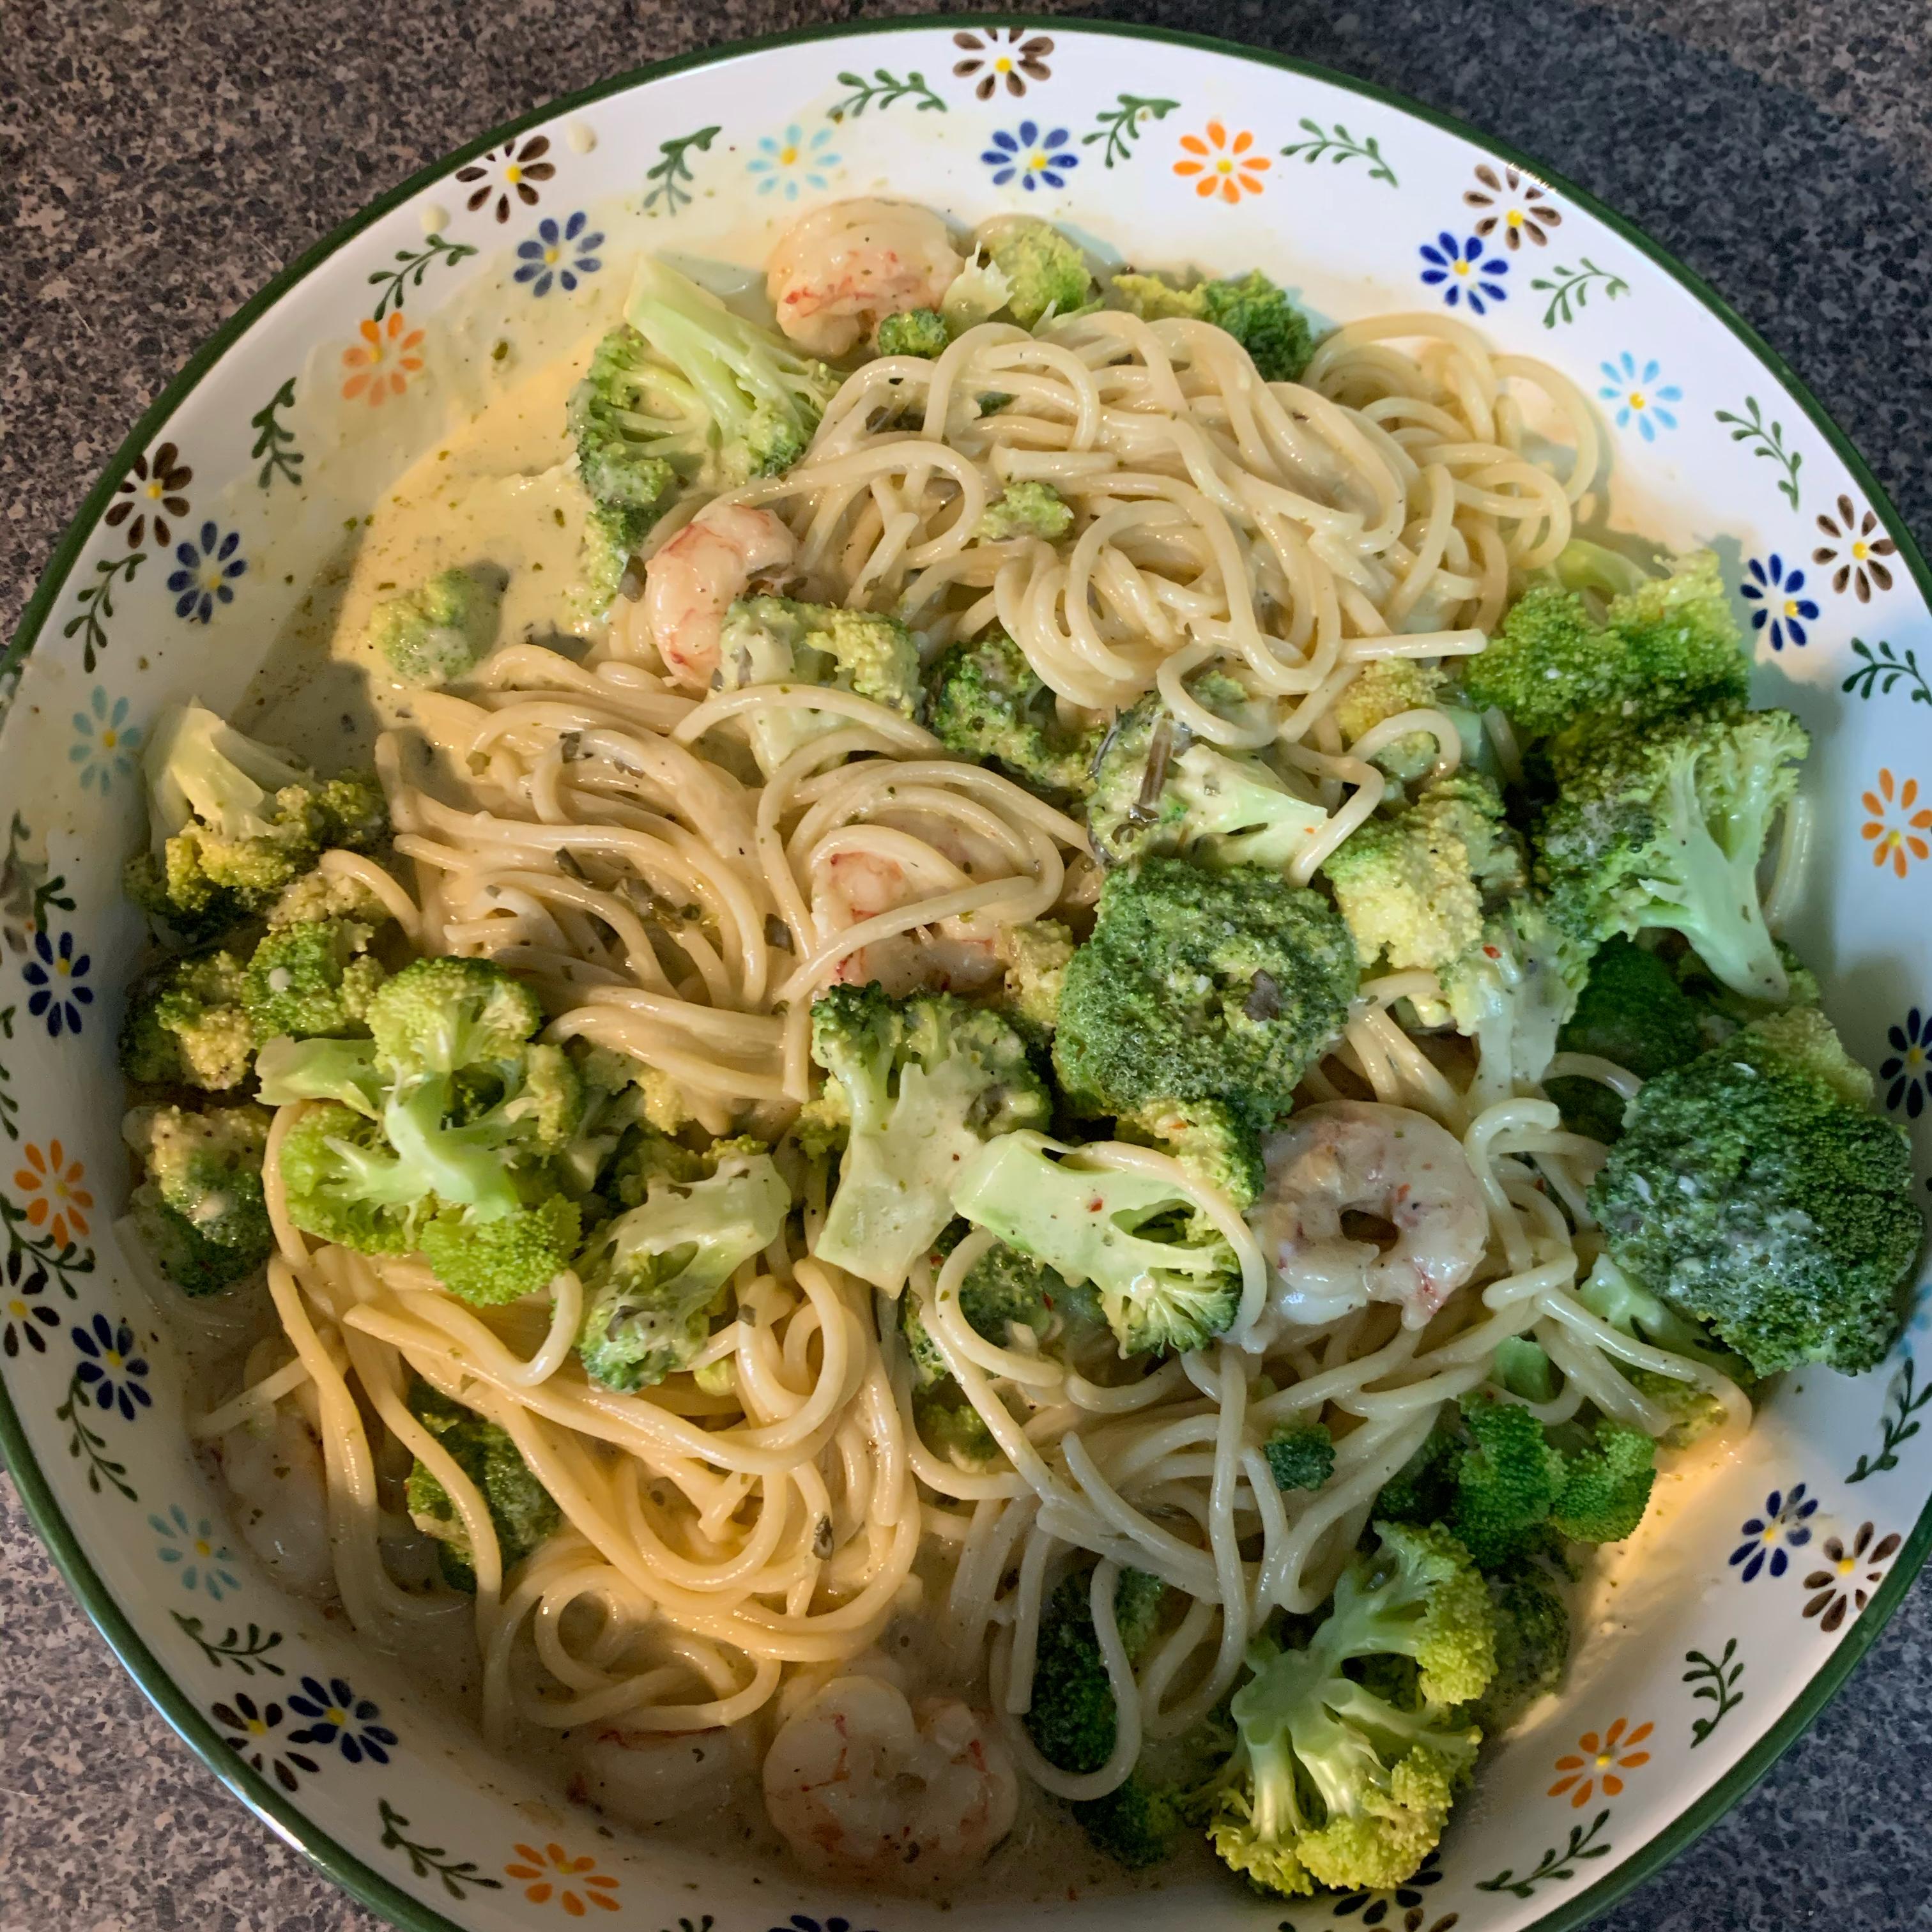 Angel Hair Pasta with Garlic Shrimp and Broccoli Jett